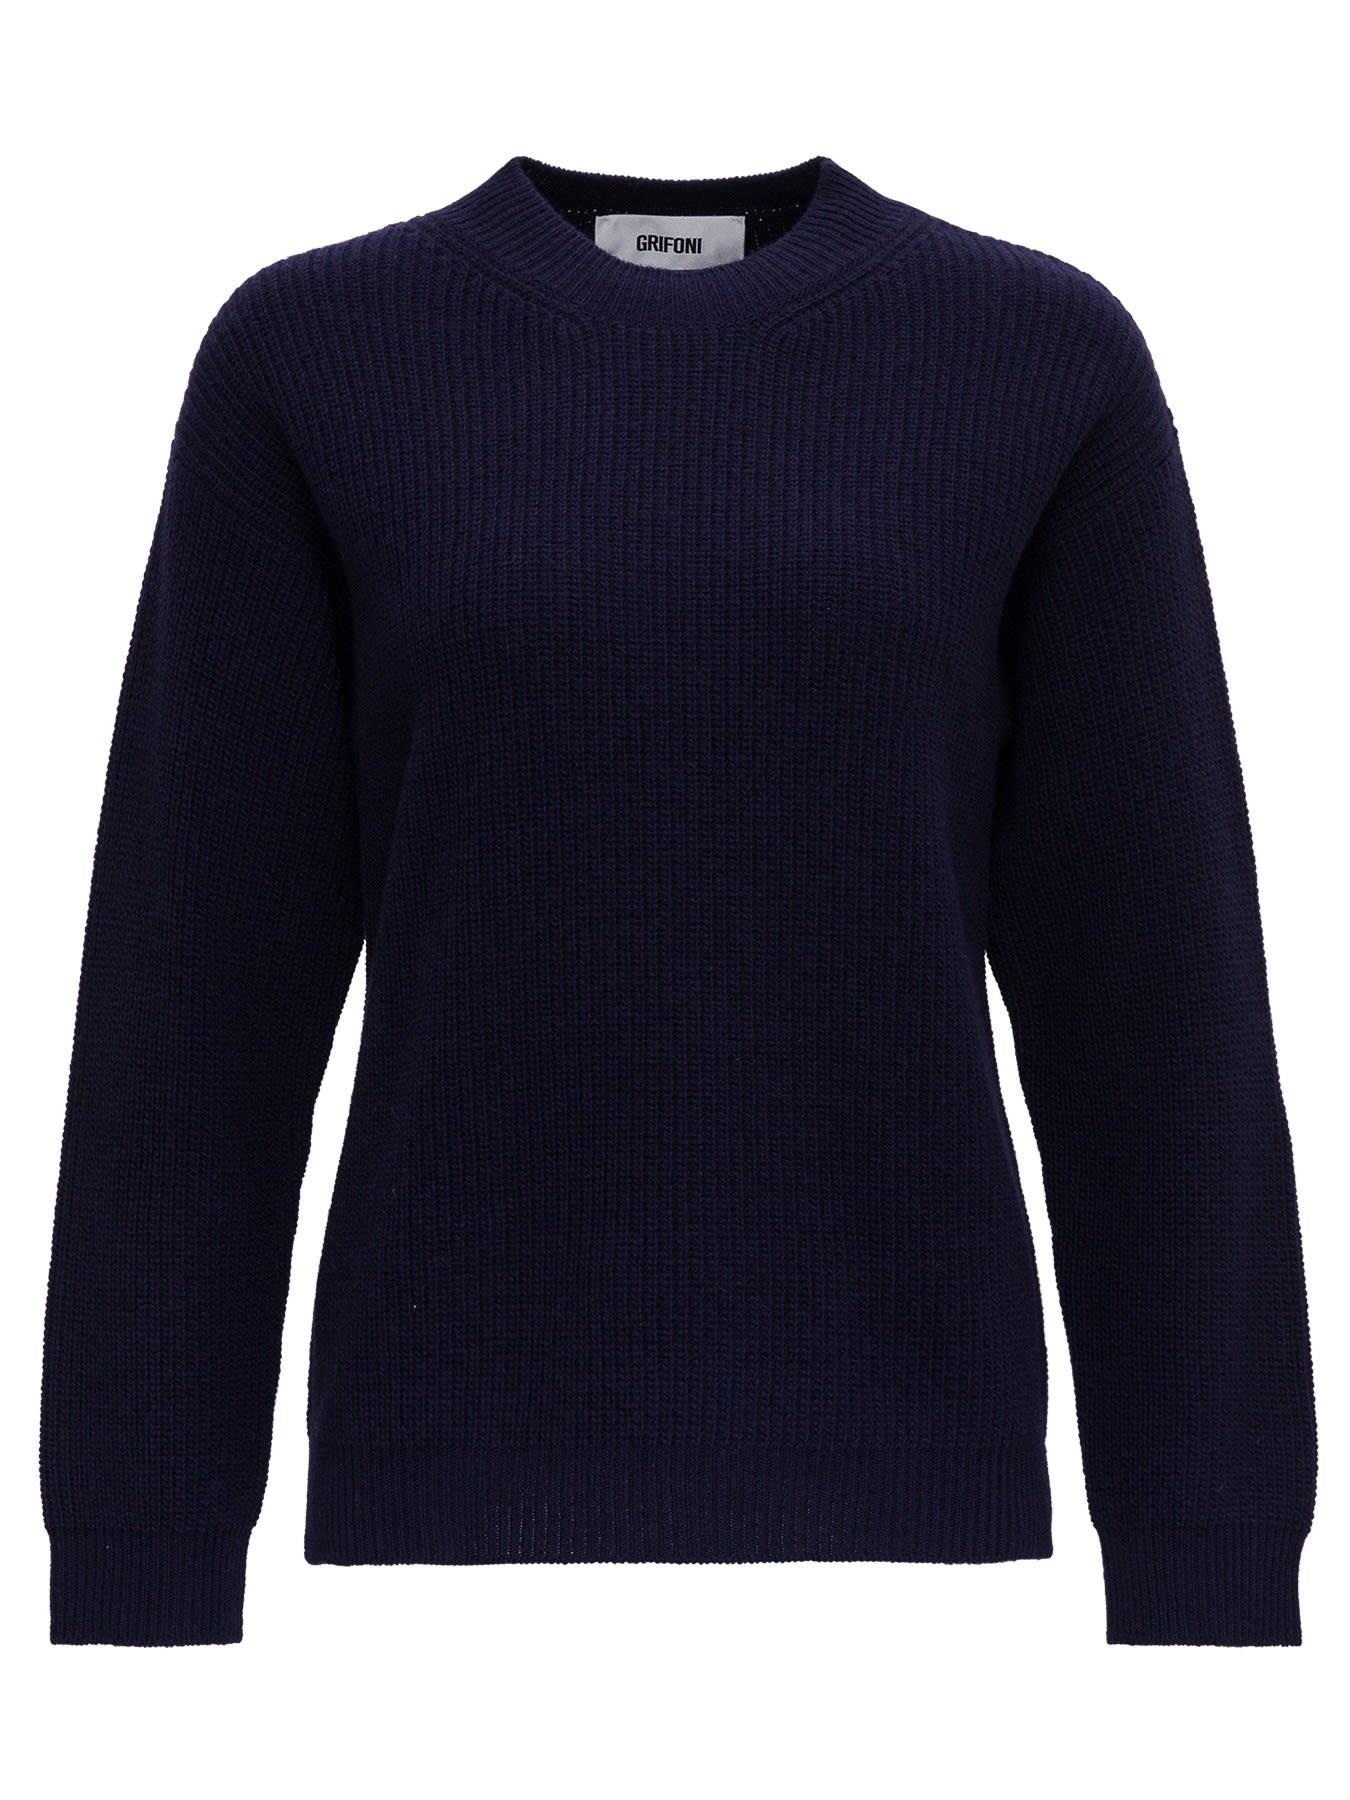 Mauro Grifoni Wool Sweater